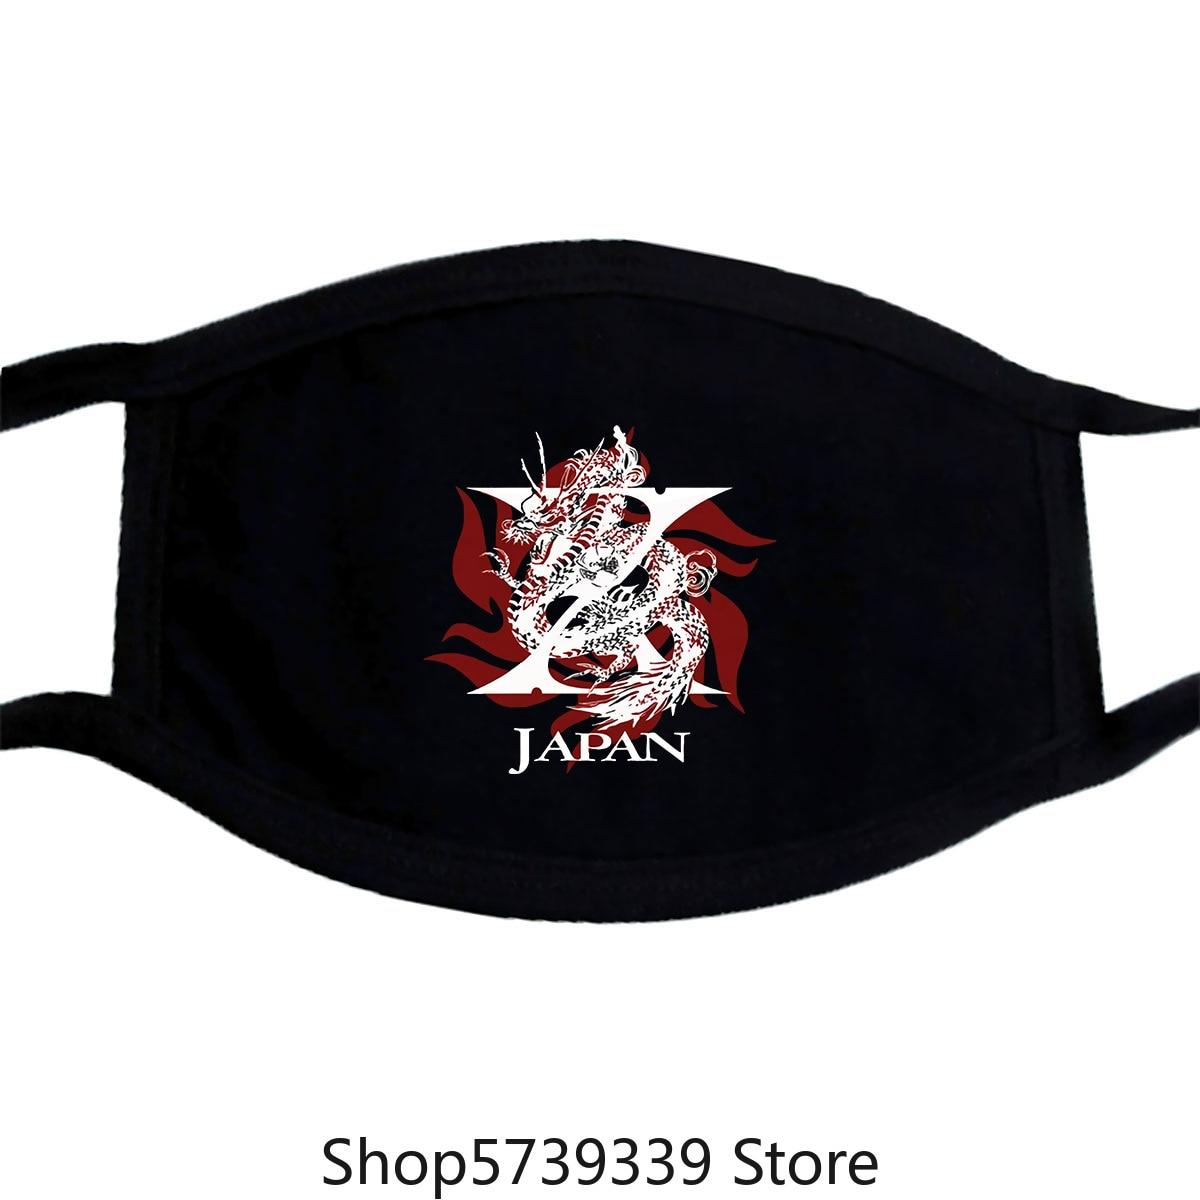 New X Japan Yoshiki Toshi Hide Japanese Heavy Metal Tour Mask Washable Reusable Mask